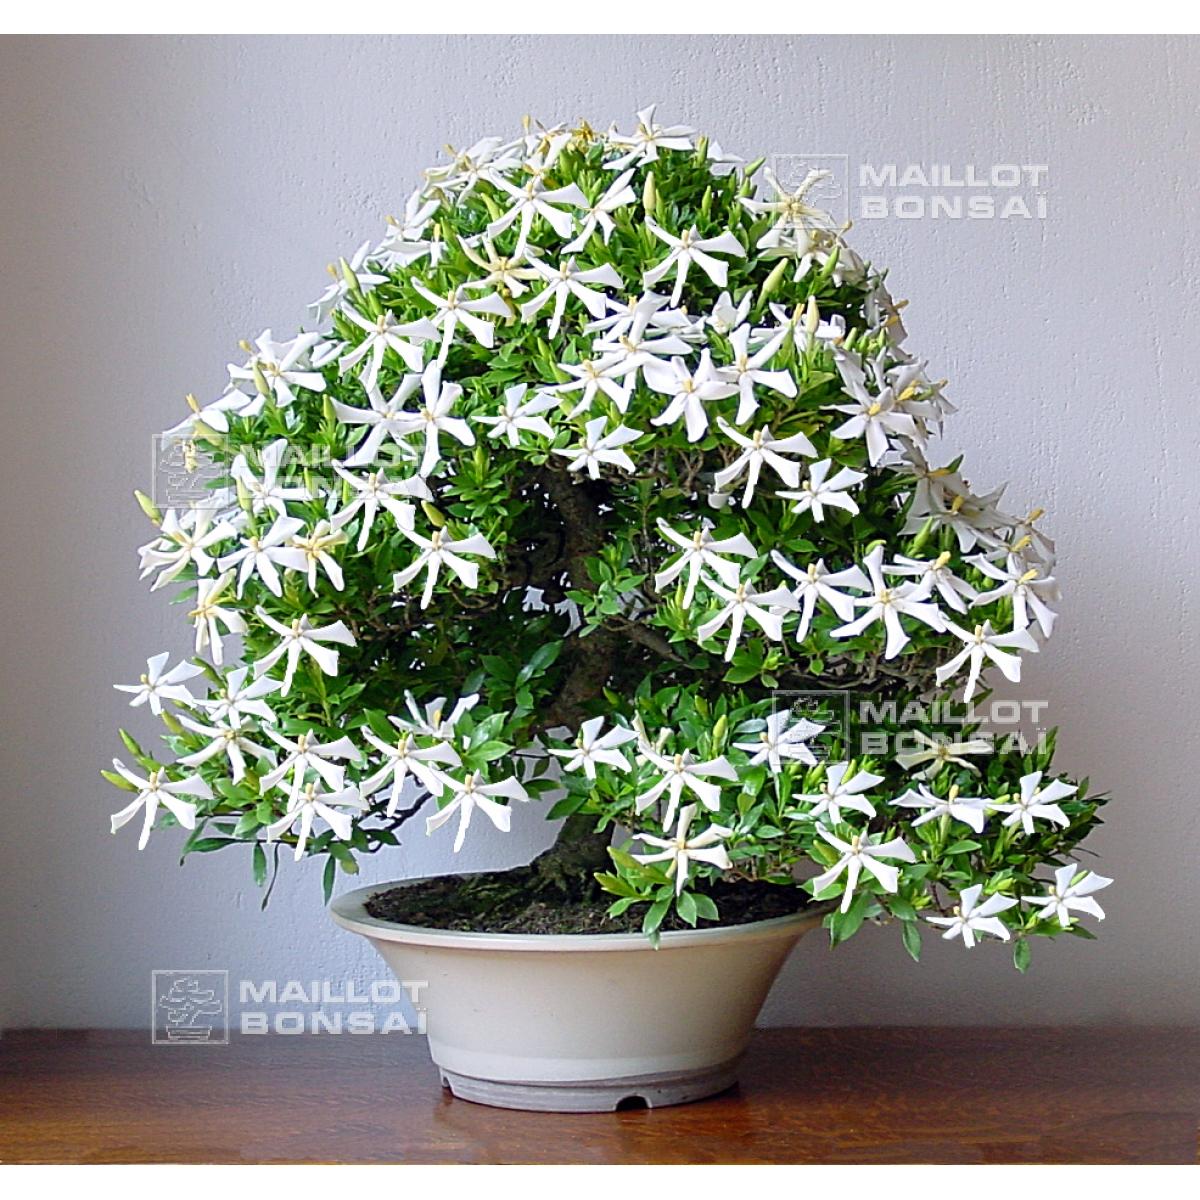 Bonsai Masterpieces Gardenia Jasminoides Bonsai Ref:24060151 From  Maillot Bonsaï   The Store MAILLOT BONSAI